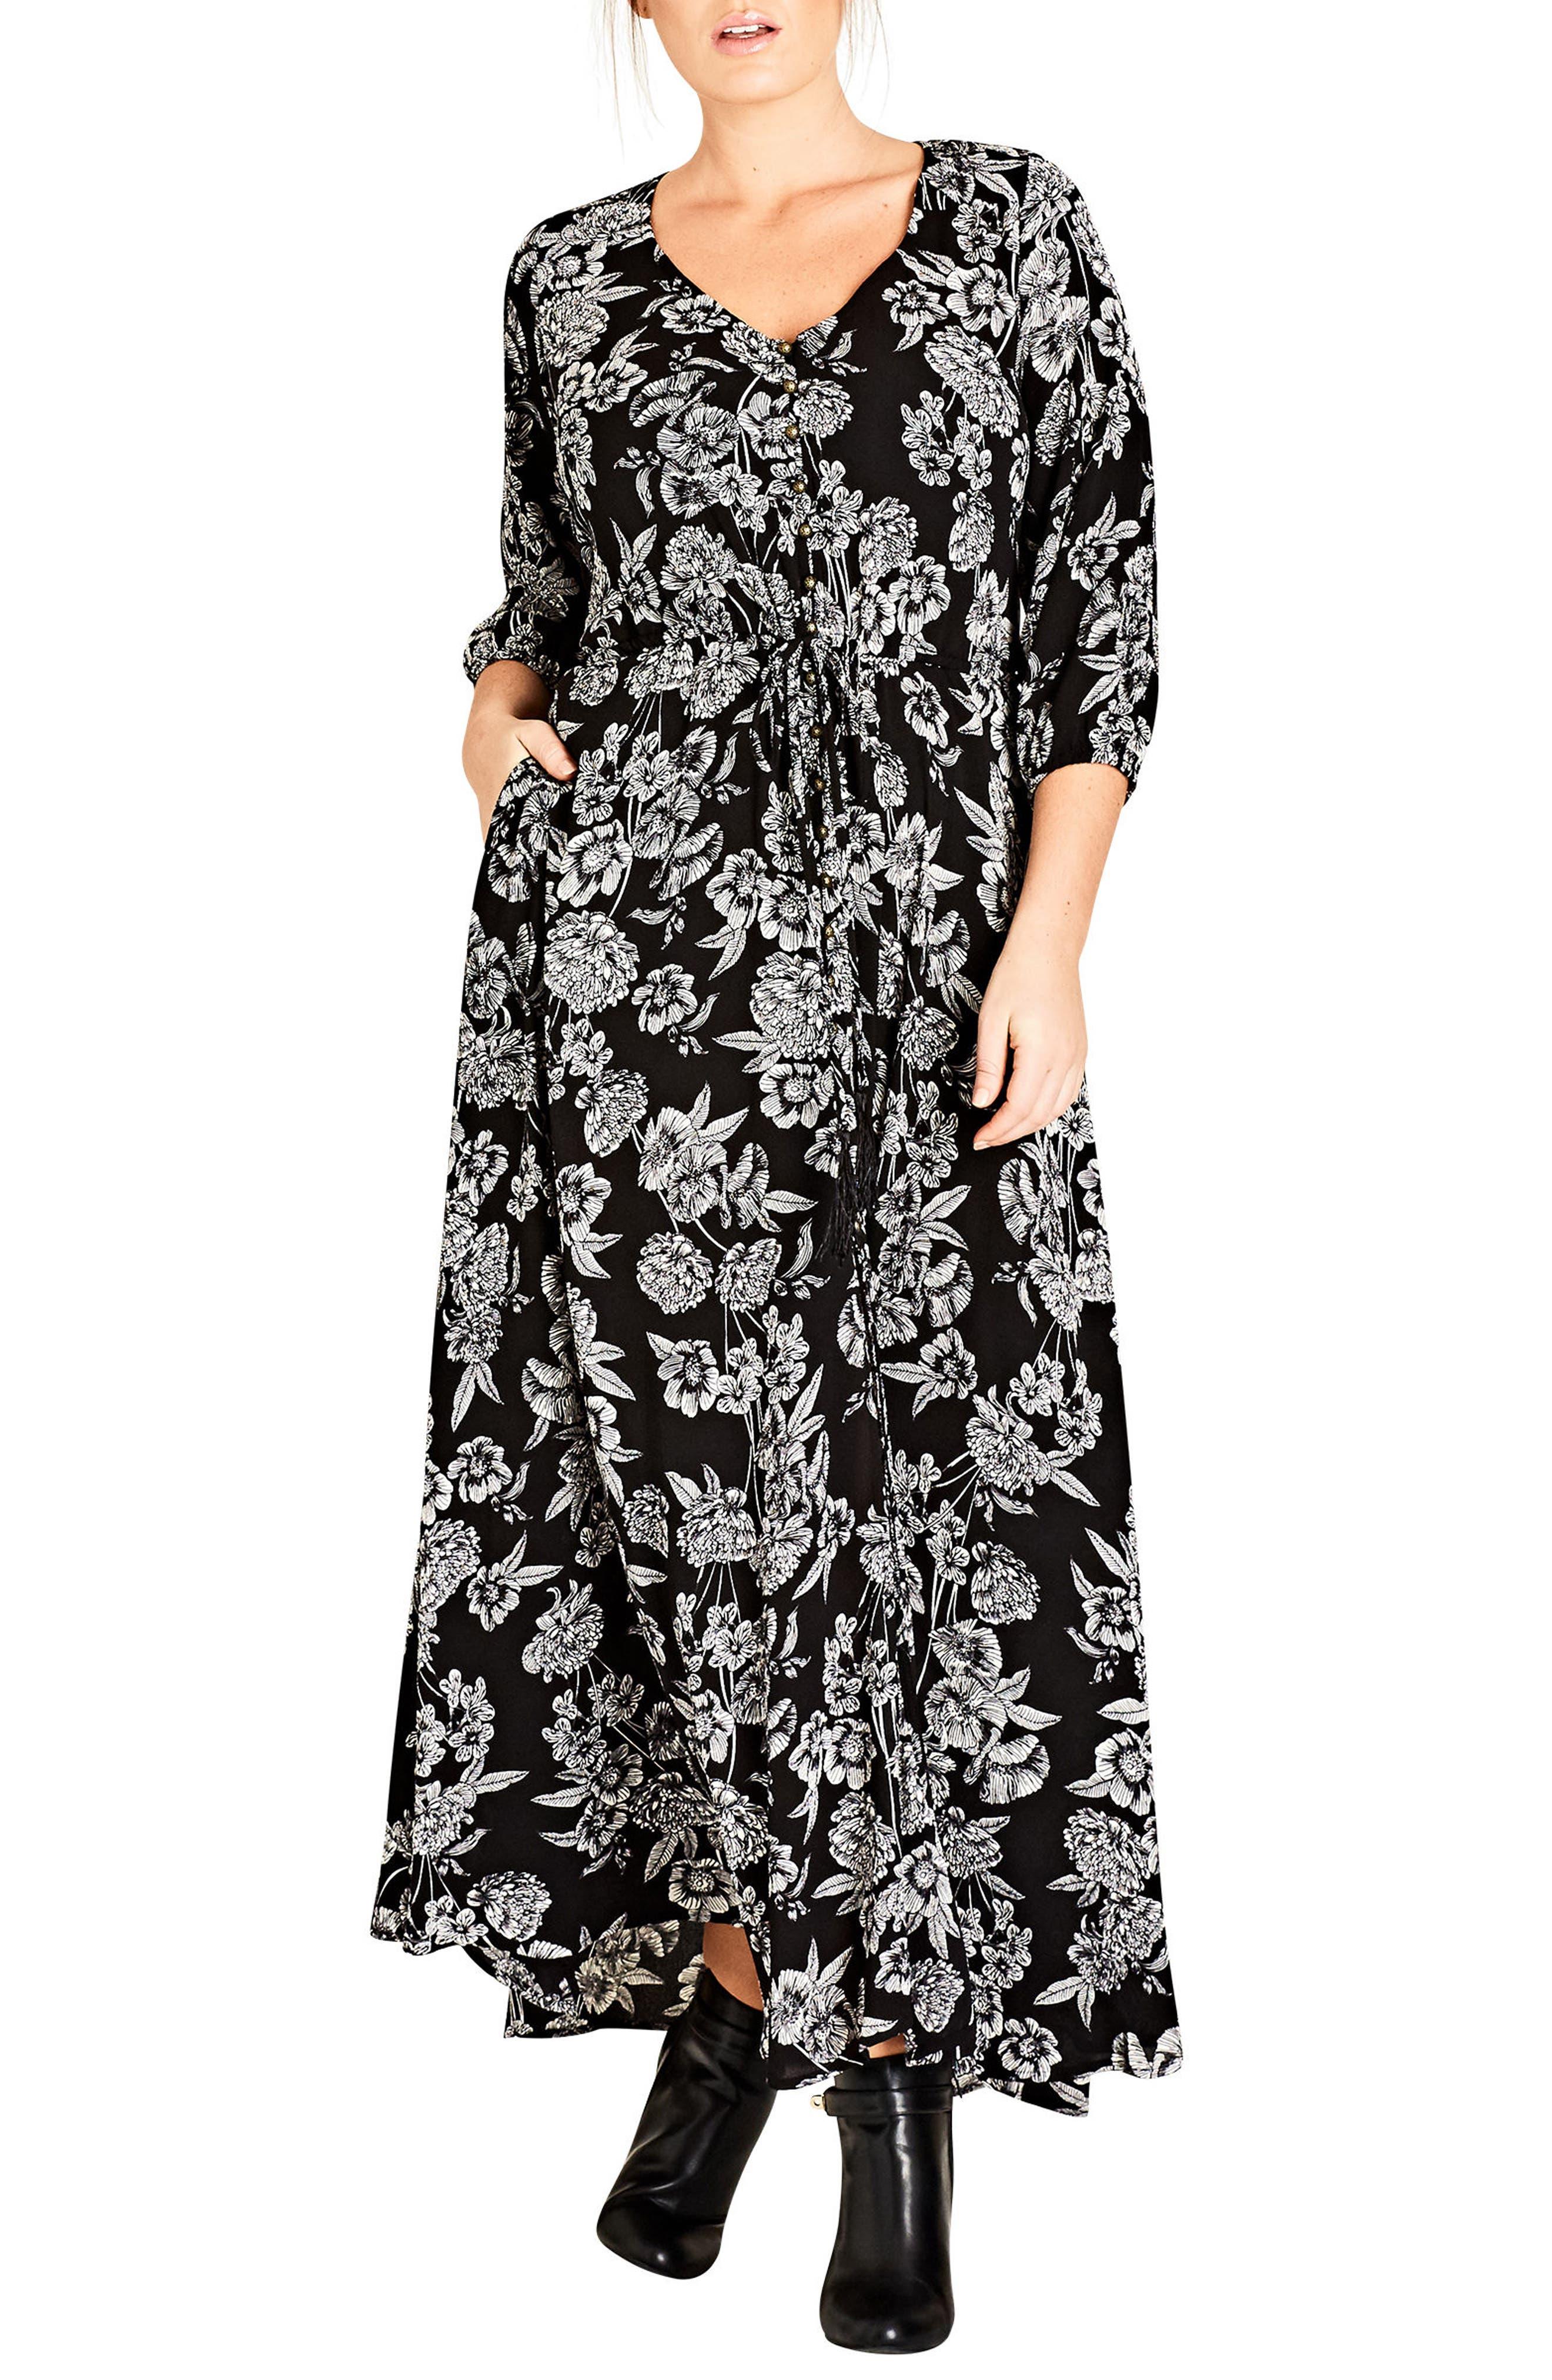 Bloomsbury Maxi Dress,                         Main,                         color, 001